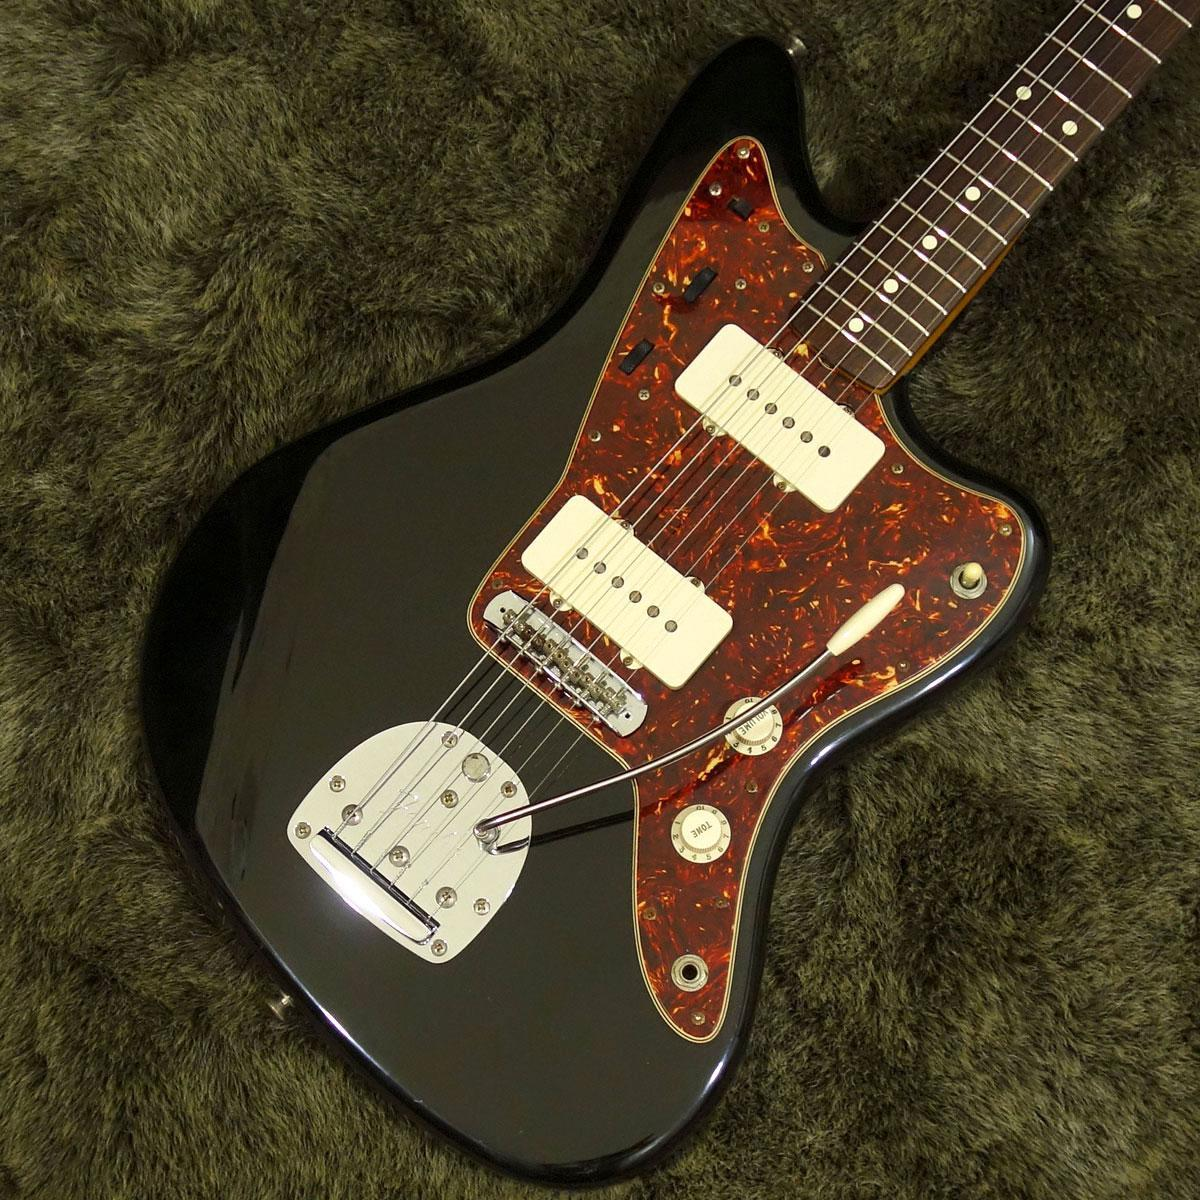 Fender American Vintage 62 Jazzmaster Black 2007 [Nagoya Sakae]